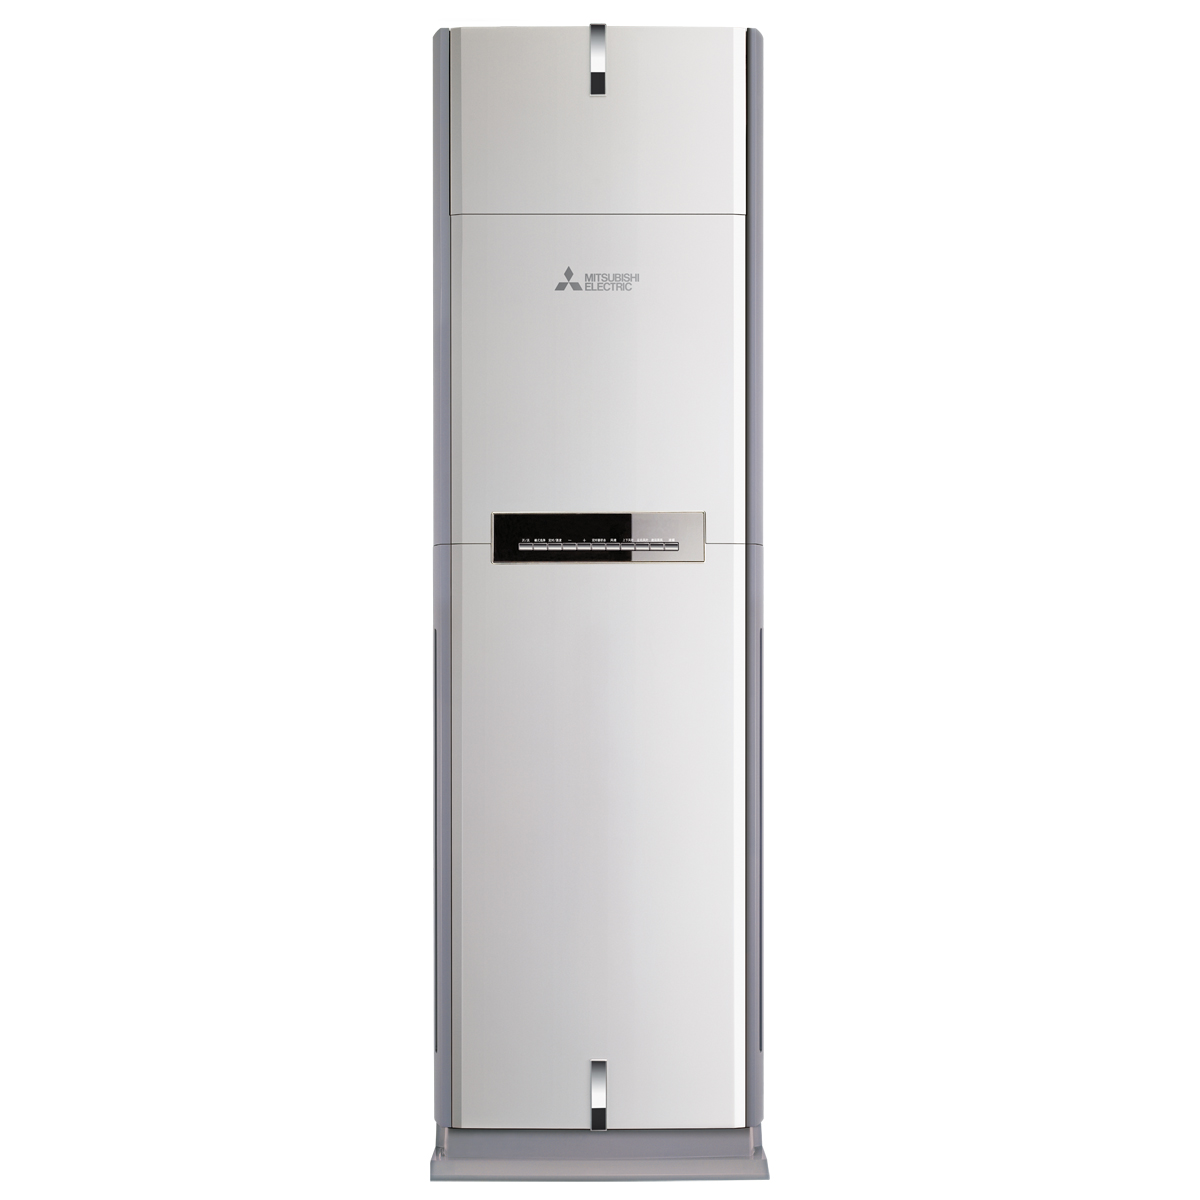 MITSUBISHI 三菱重工 KFR-57LW/D 2.5匹 定频 立式柜机空调